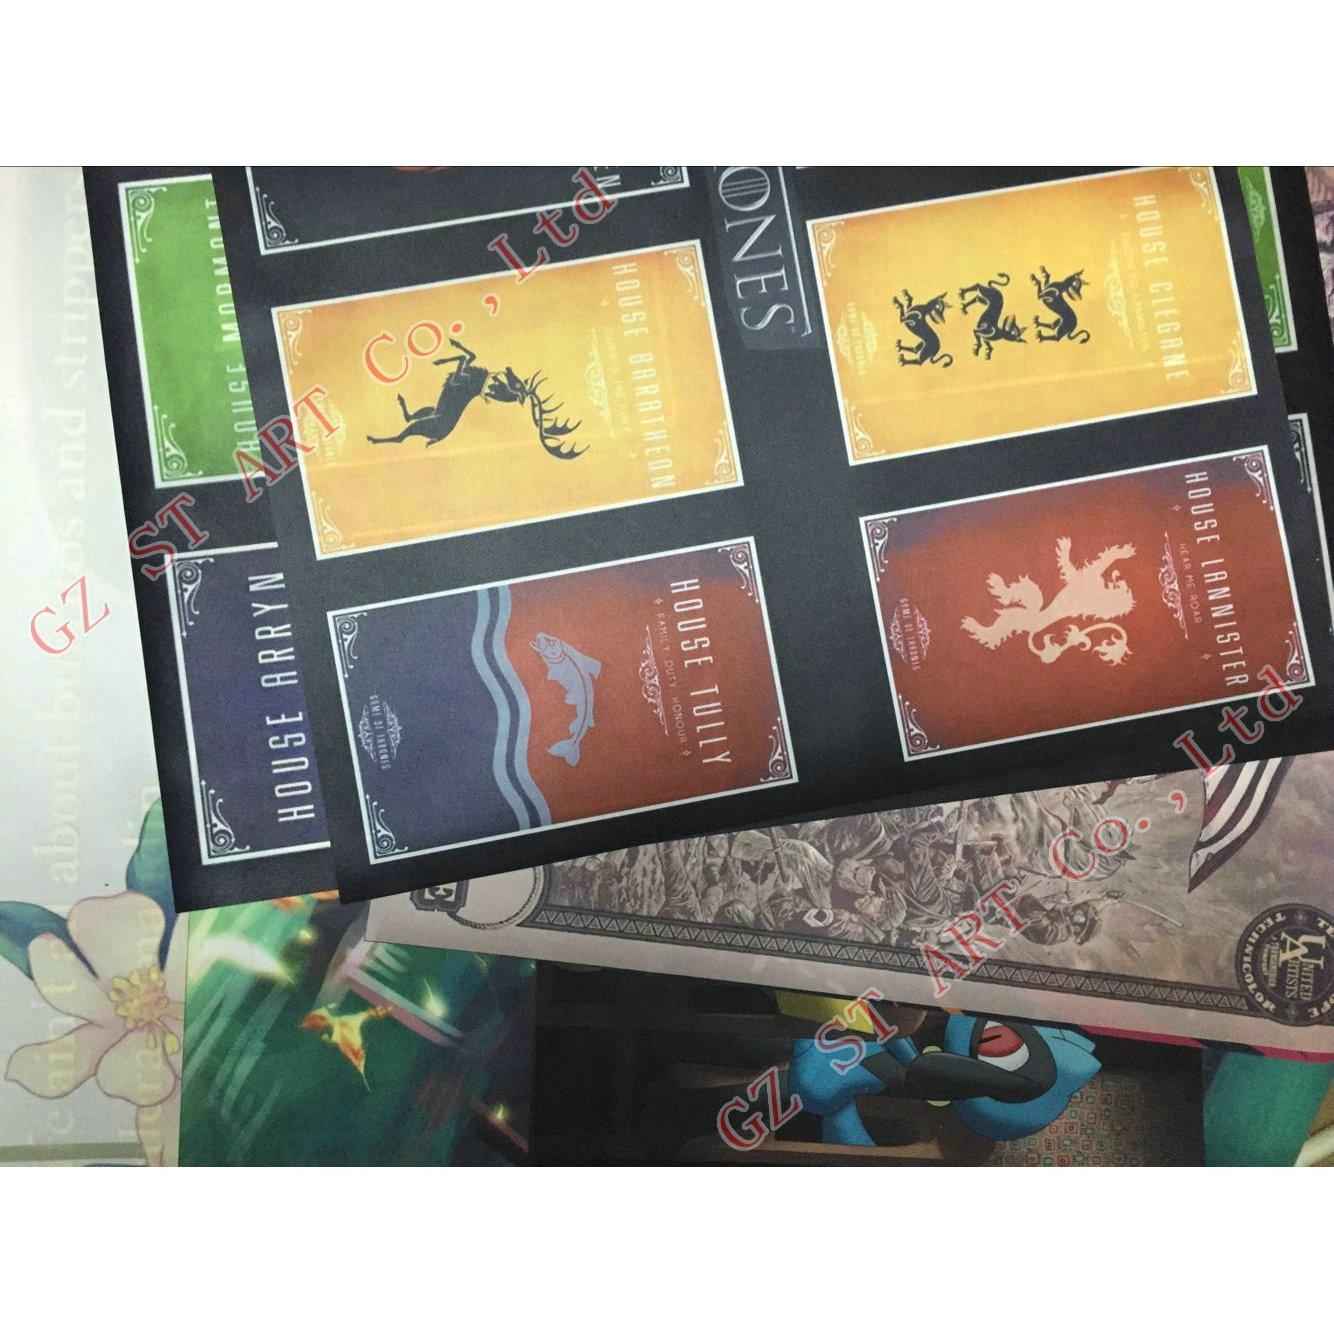 Bloodborne Game Art Silk Fabric Poster Print 13x20 24x36inch 001